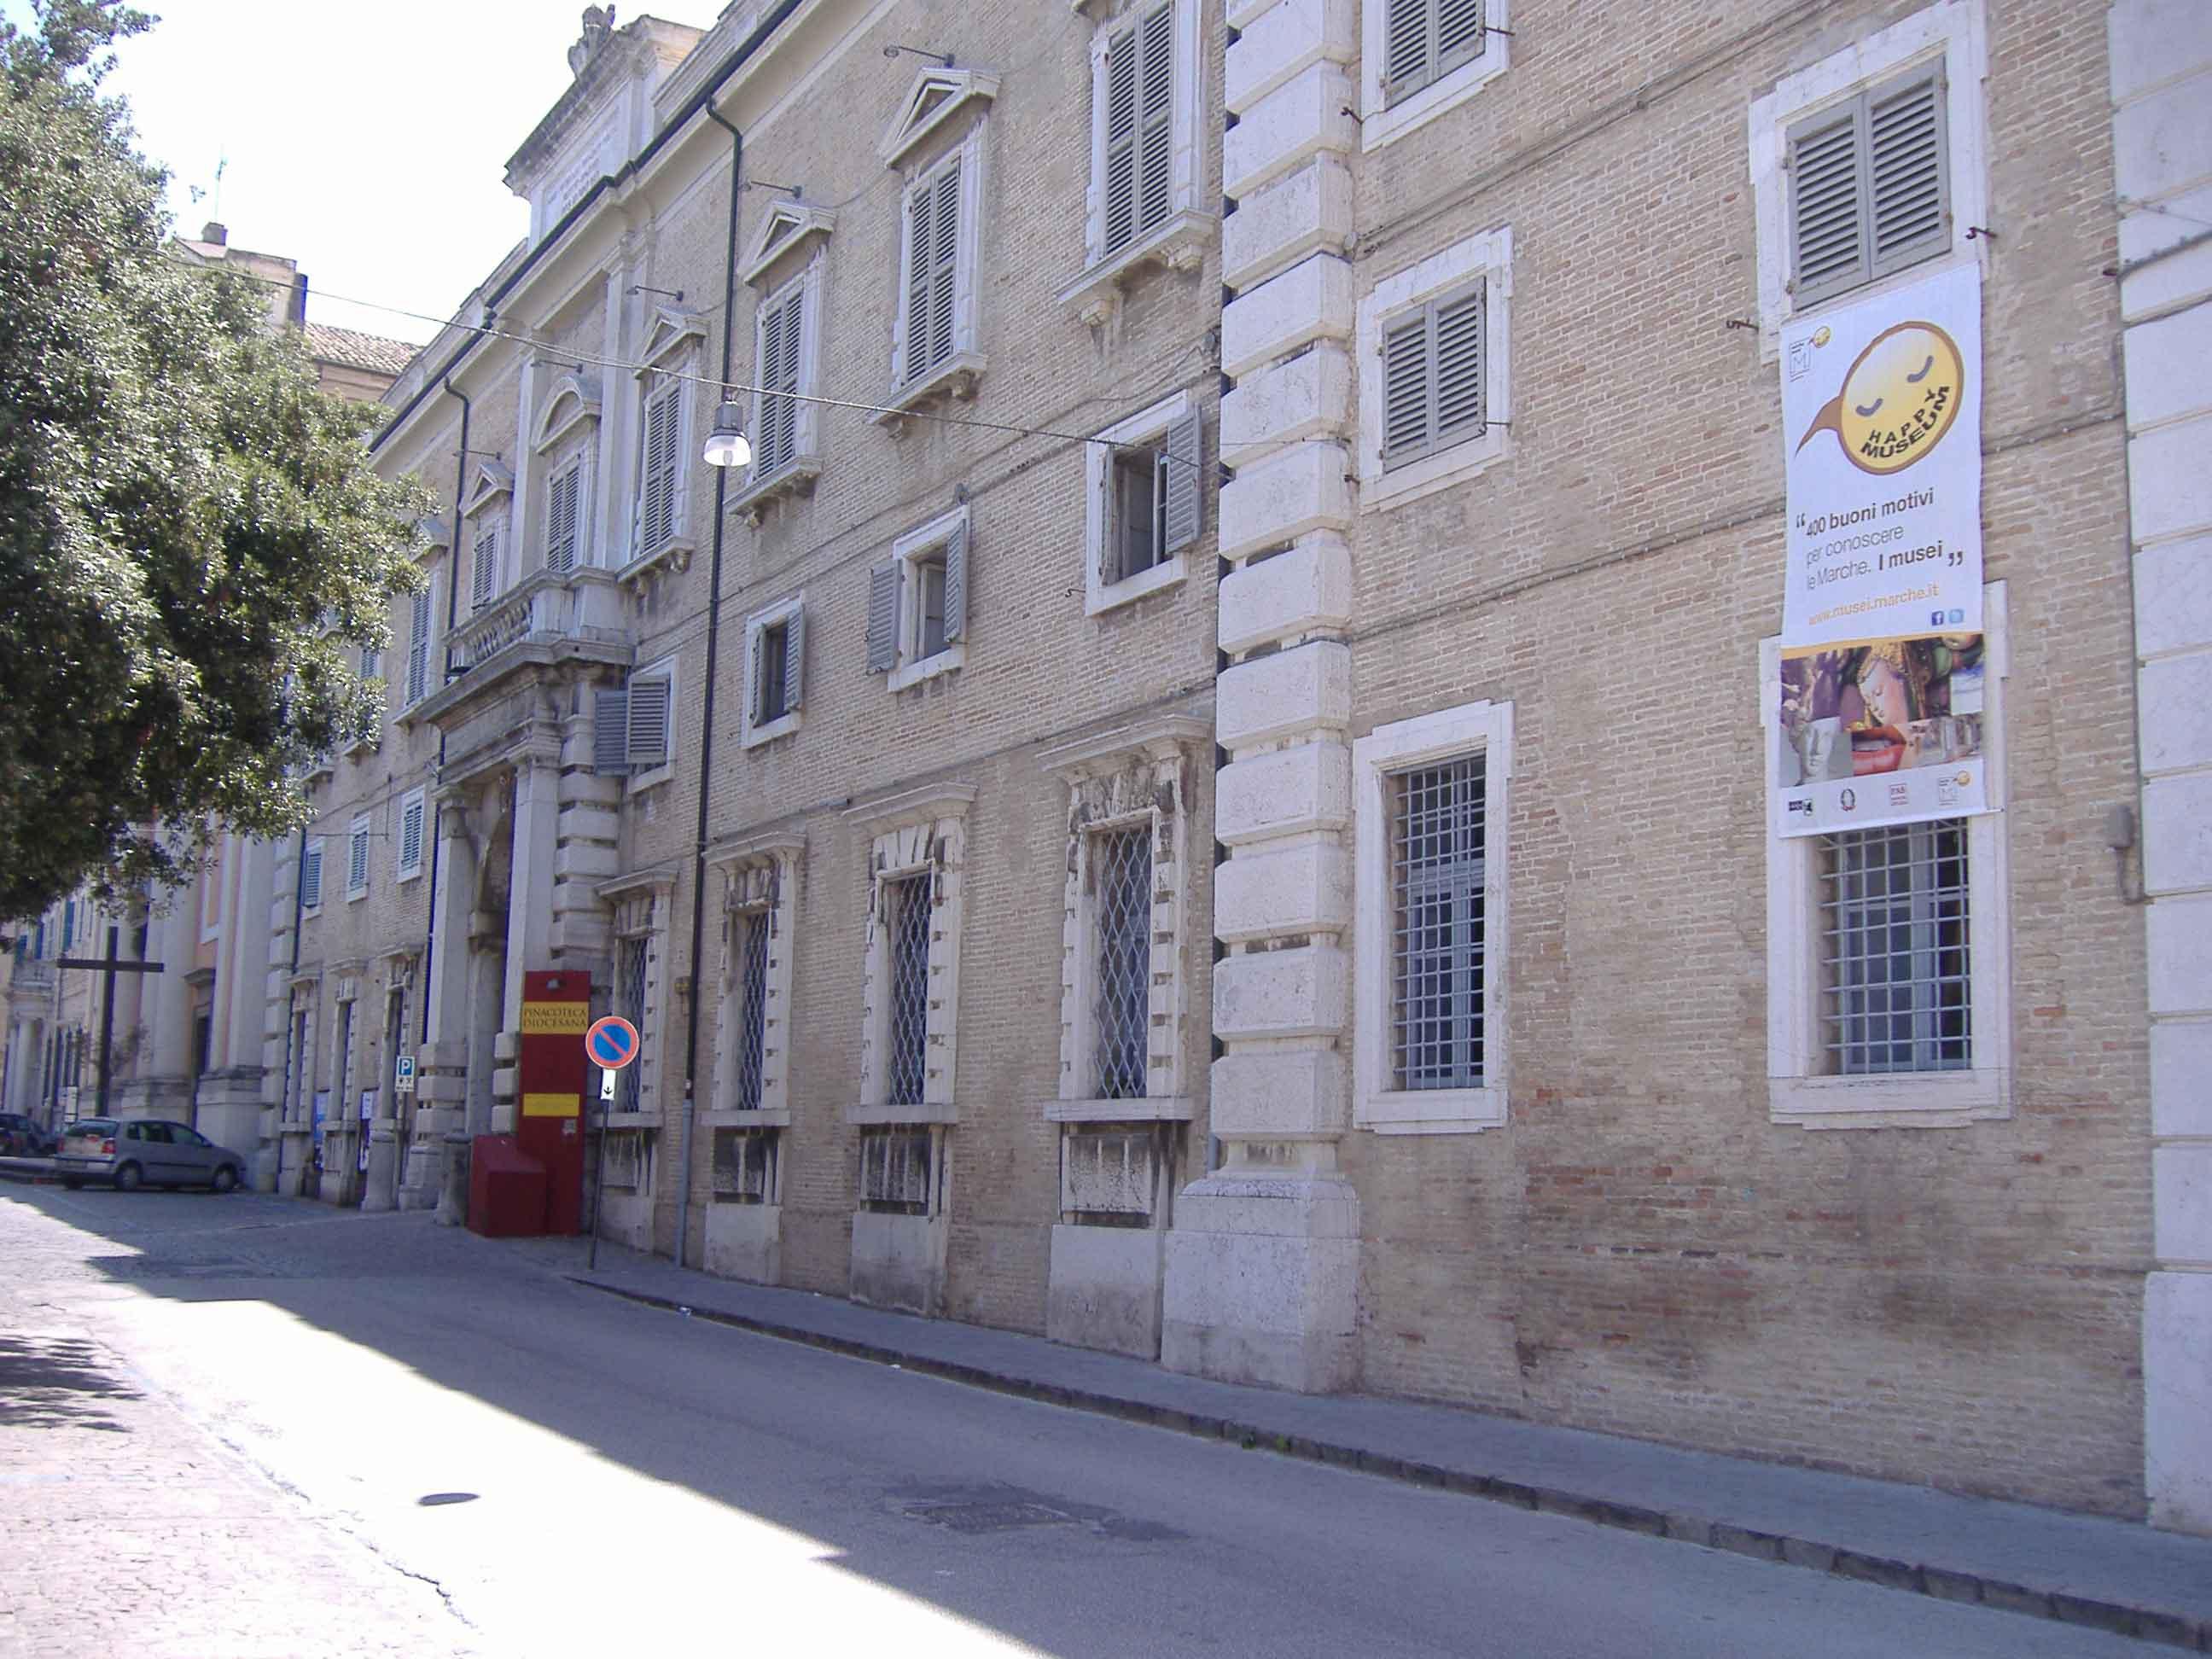 Pinacoteca-Diocesana-Senigallia-Fronte